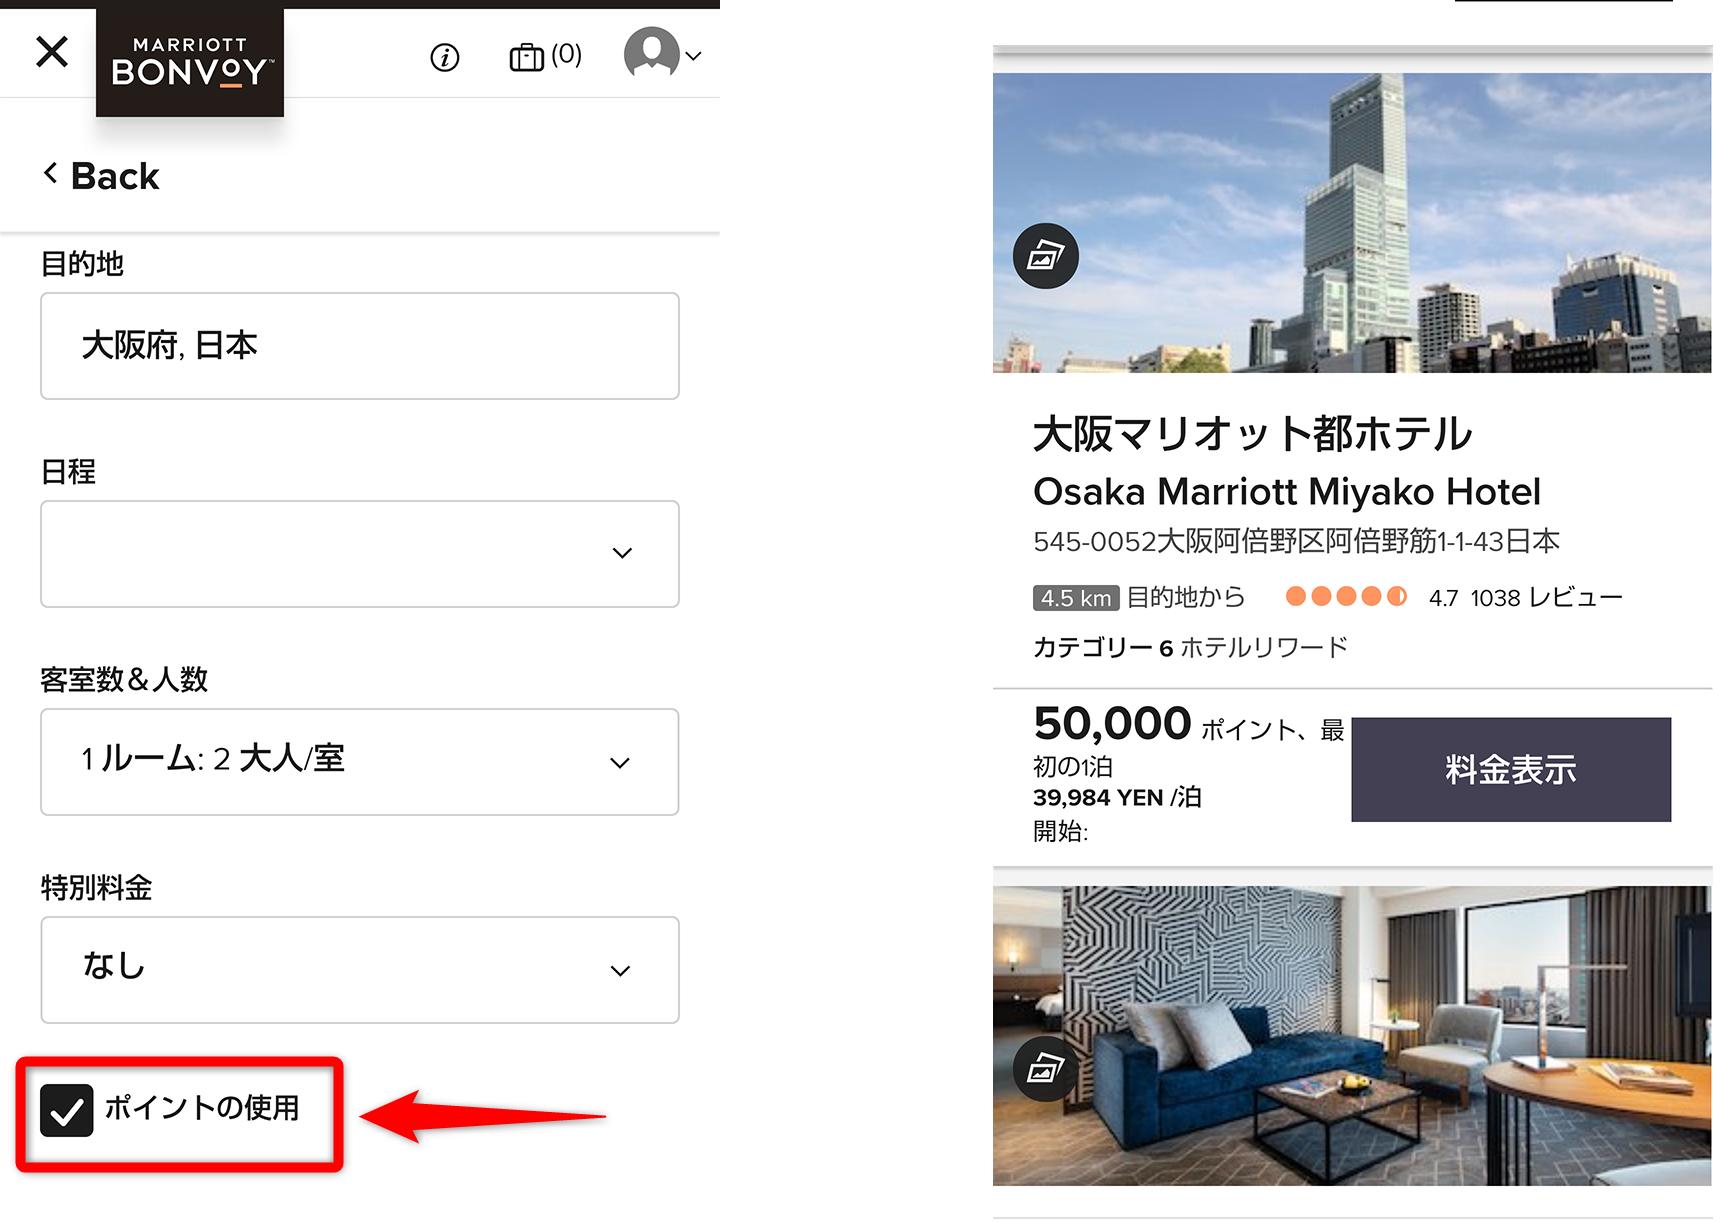 Marriott BONVOY ホテル予約画面の説明